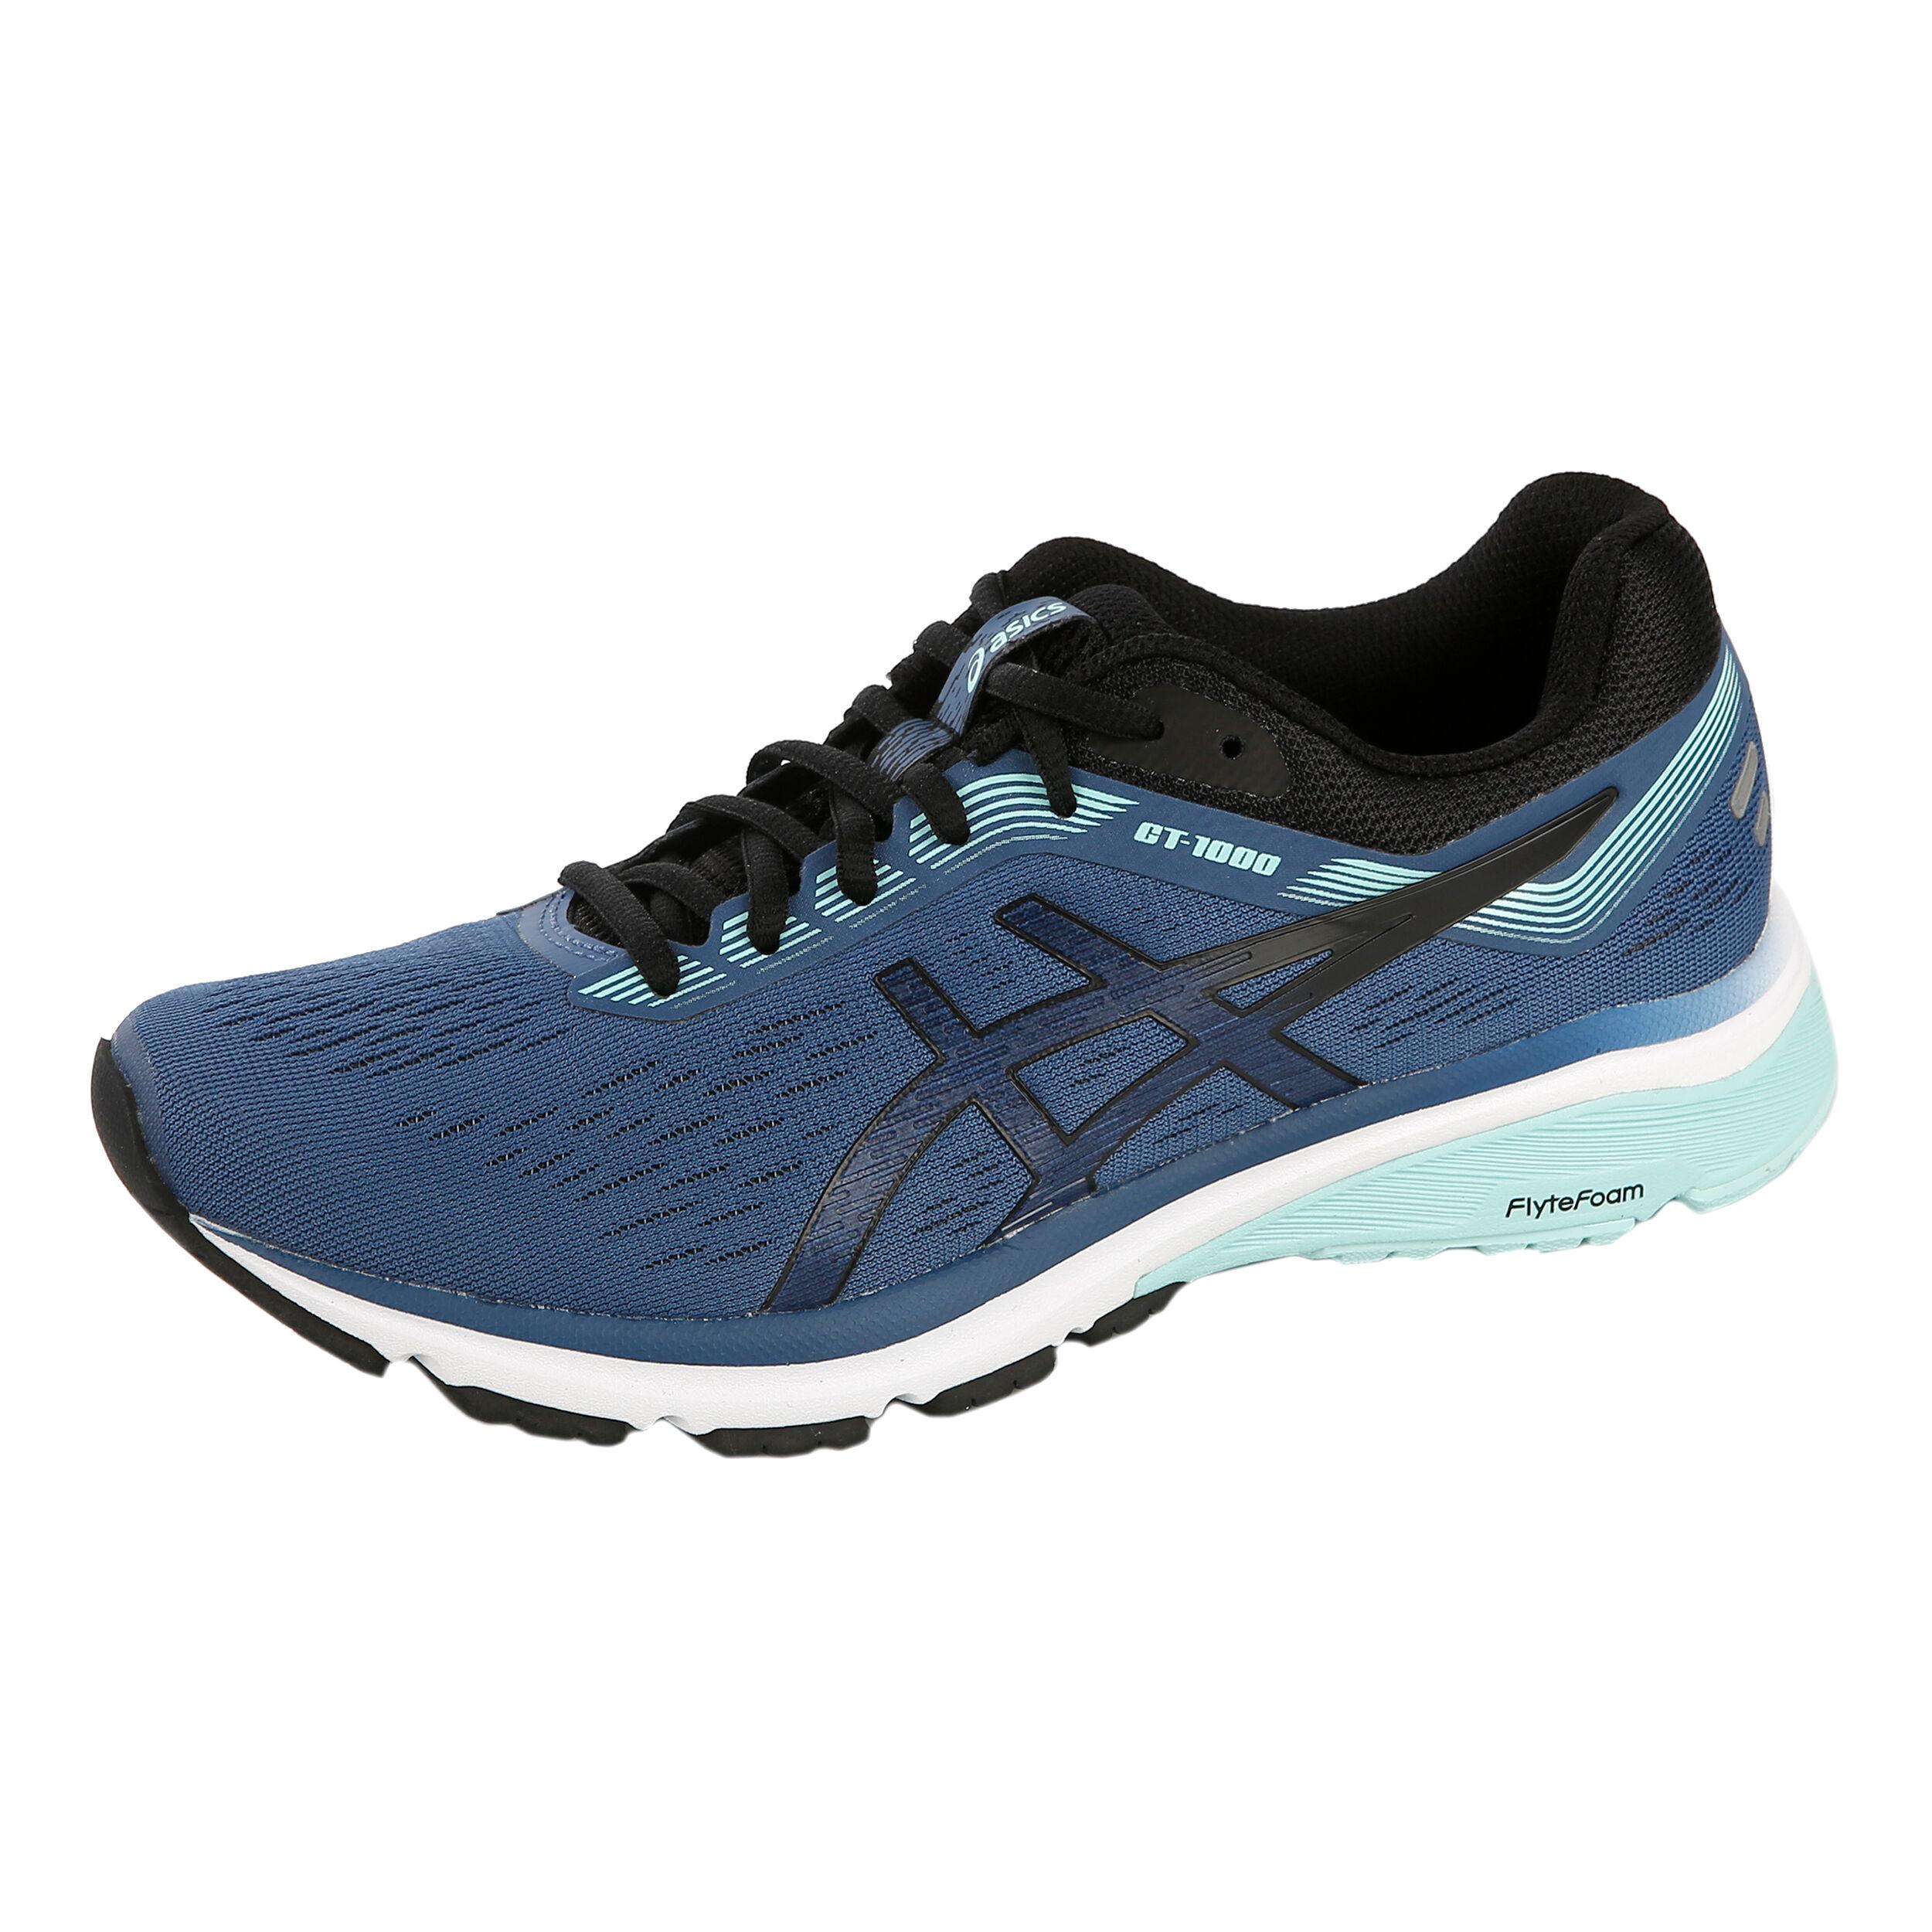 buy Asics GT-1000 7 Stability Running Shoe Women - Blue ...